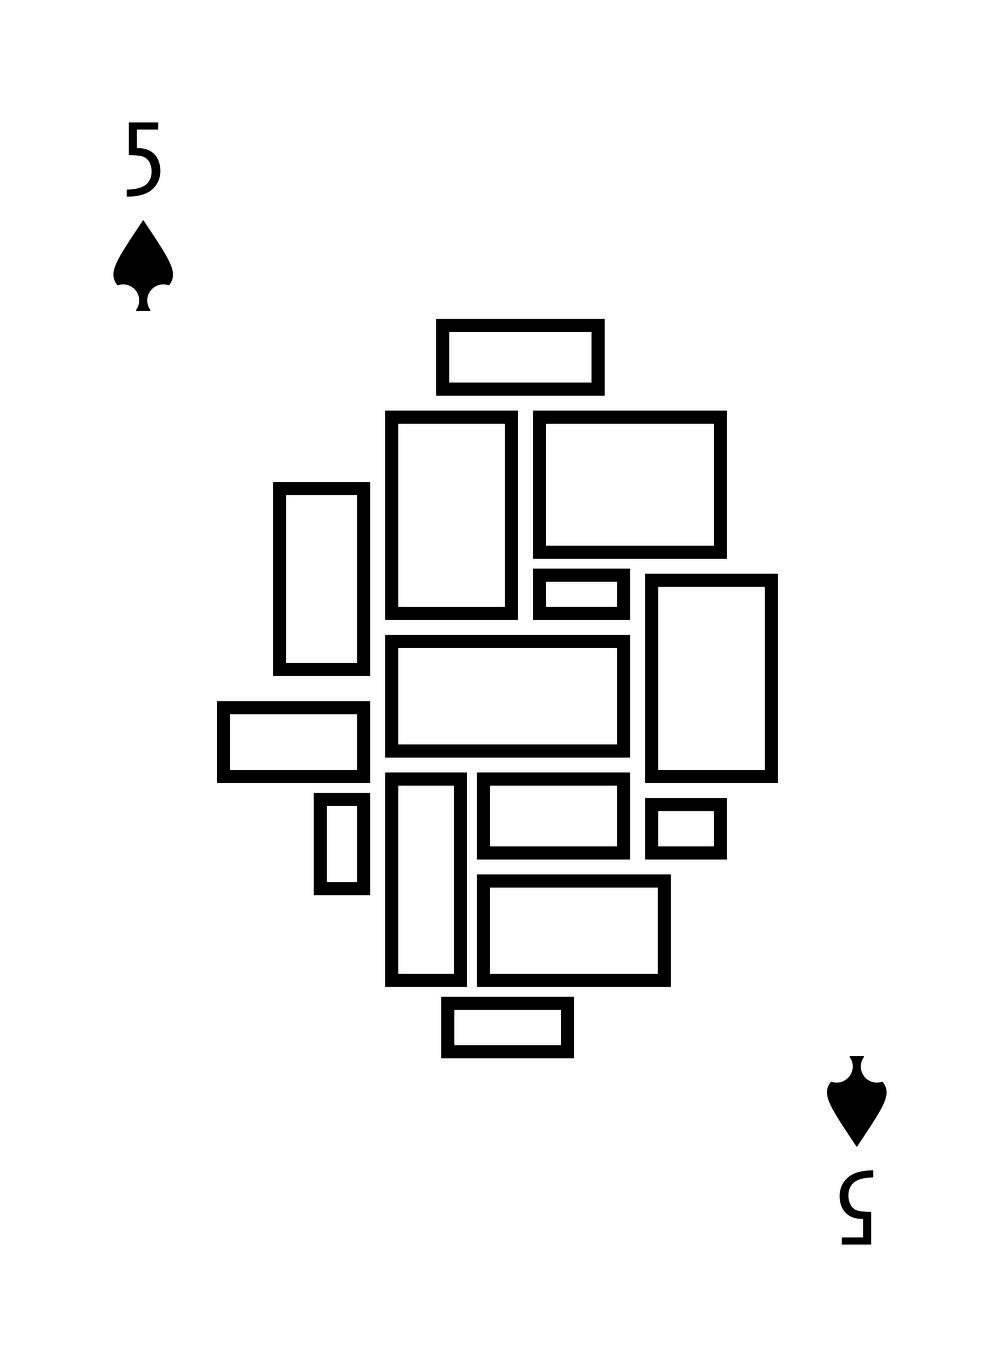 52_2__0008_Spades_5.jpg